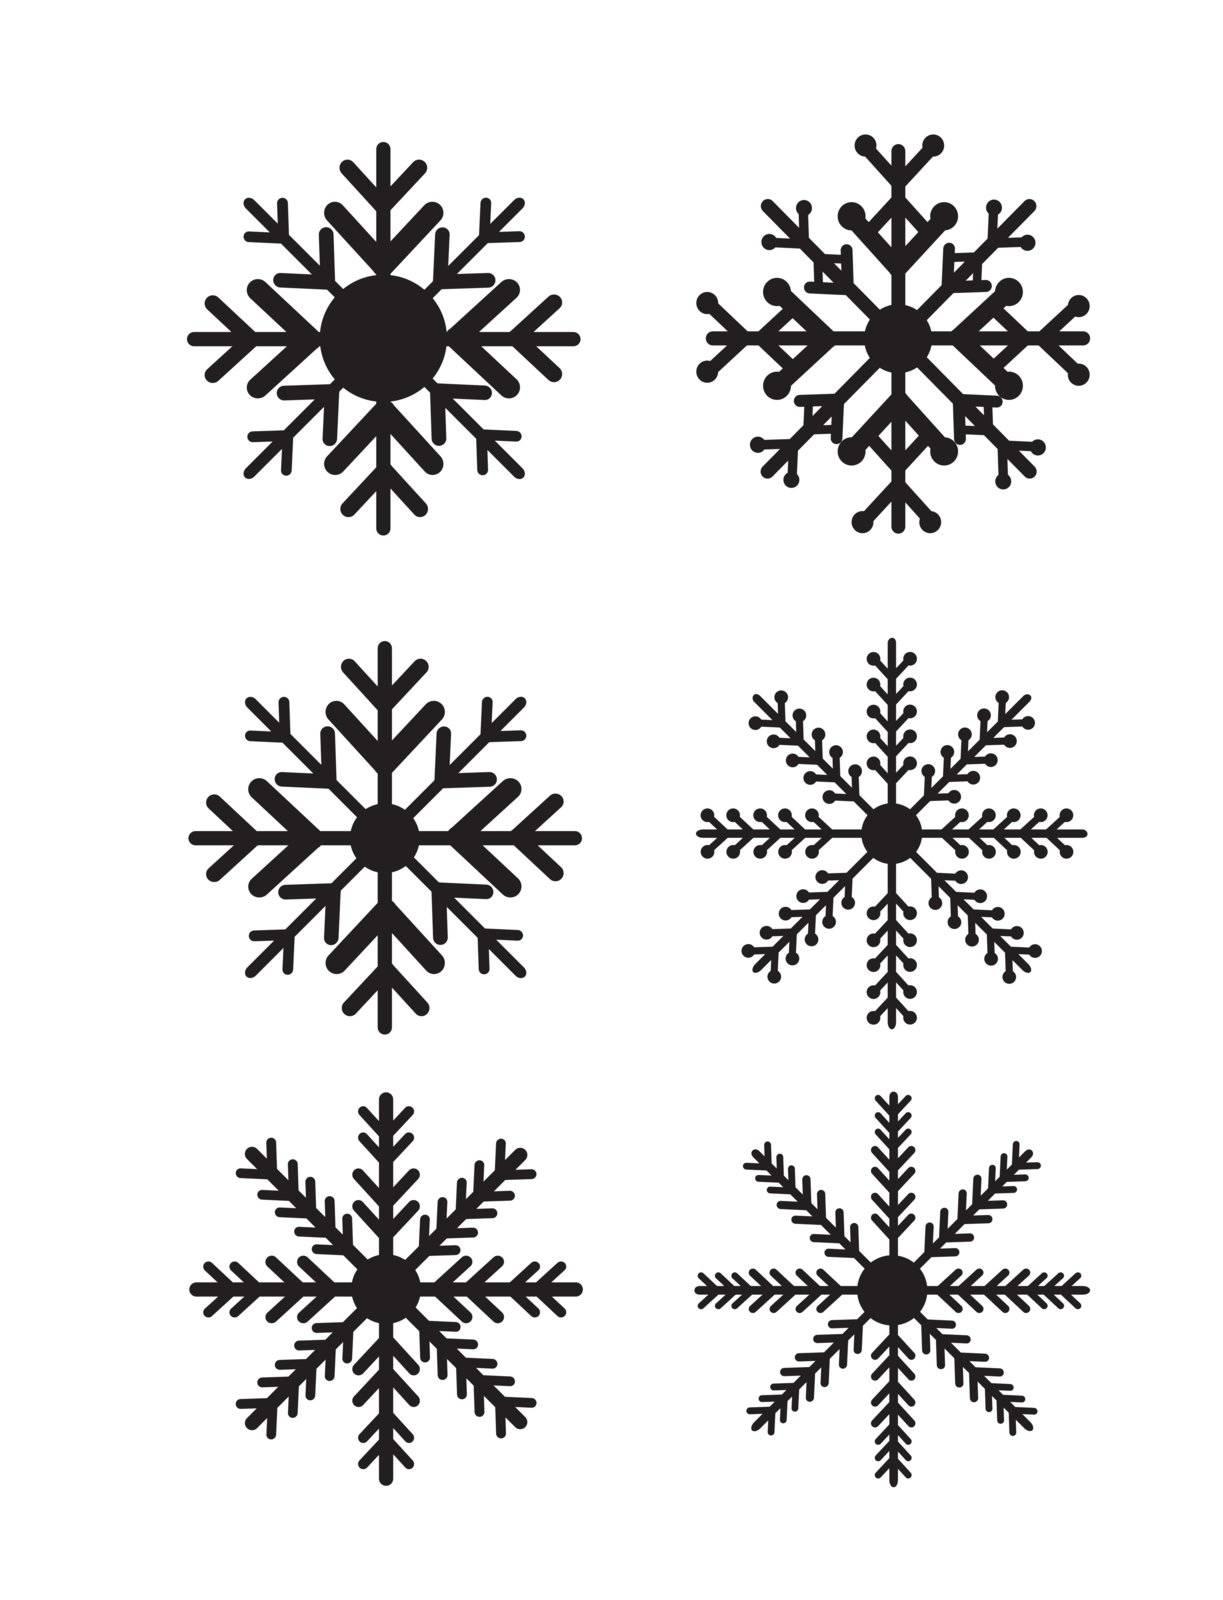 decorative background with black symbols